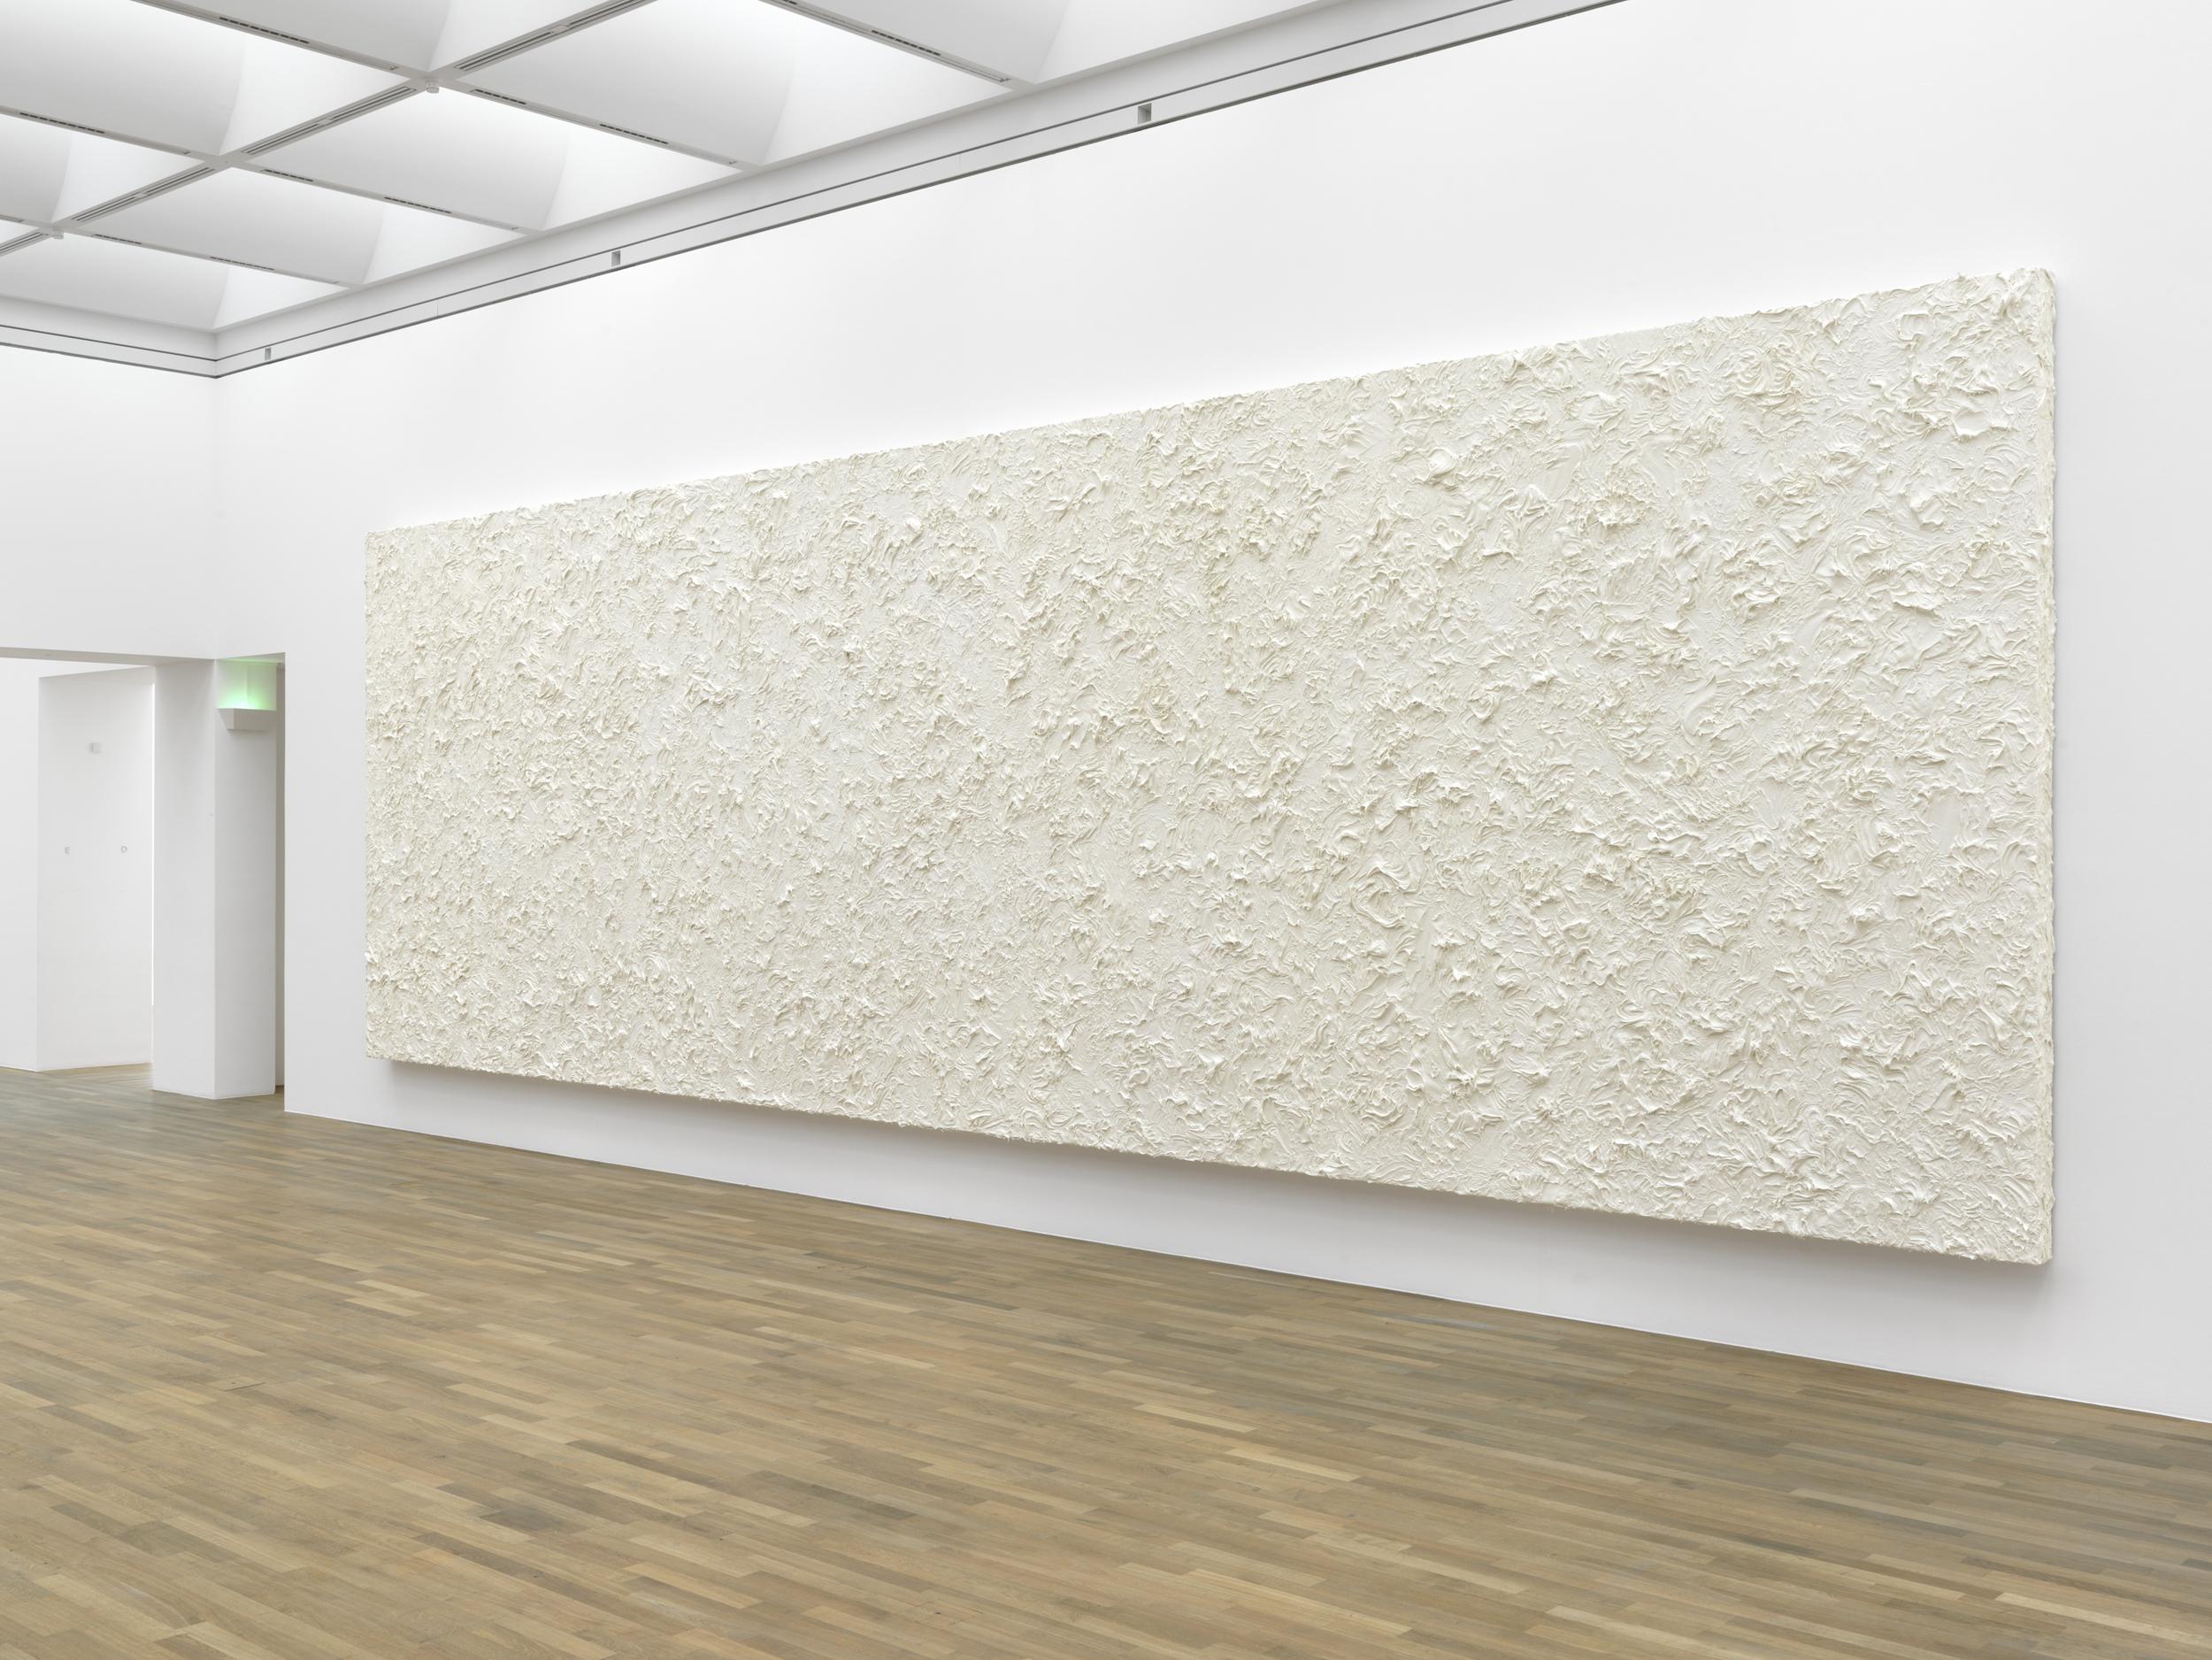 Untitled, 2011, Penaten baby cream on laminated chipboard, 350 x 1100 x 16 cm